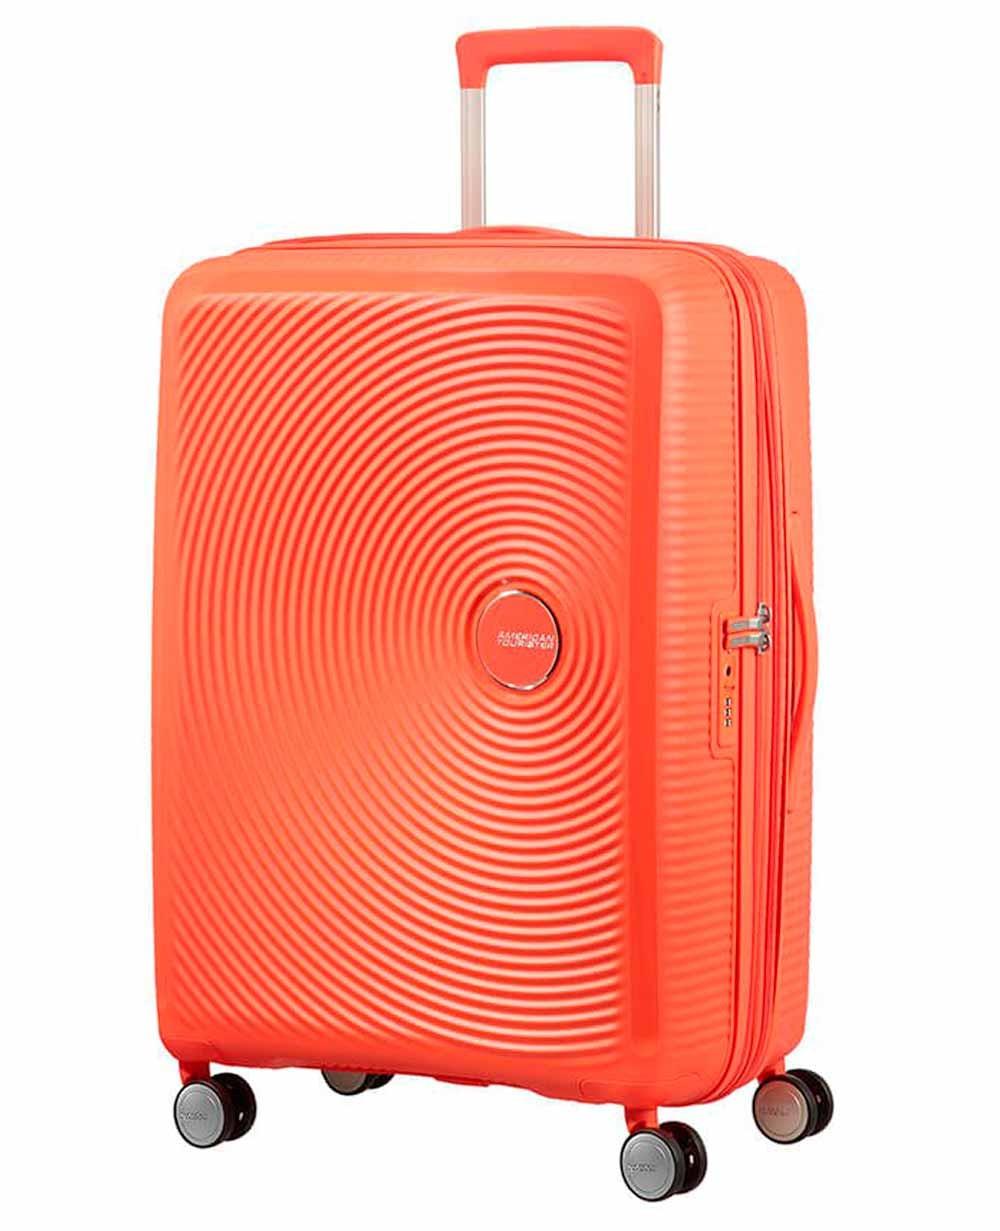 American Tourister Soundbox Maleta mediana Naranja (Foto )